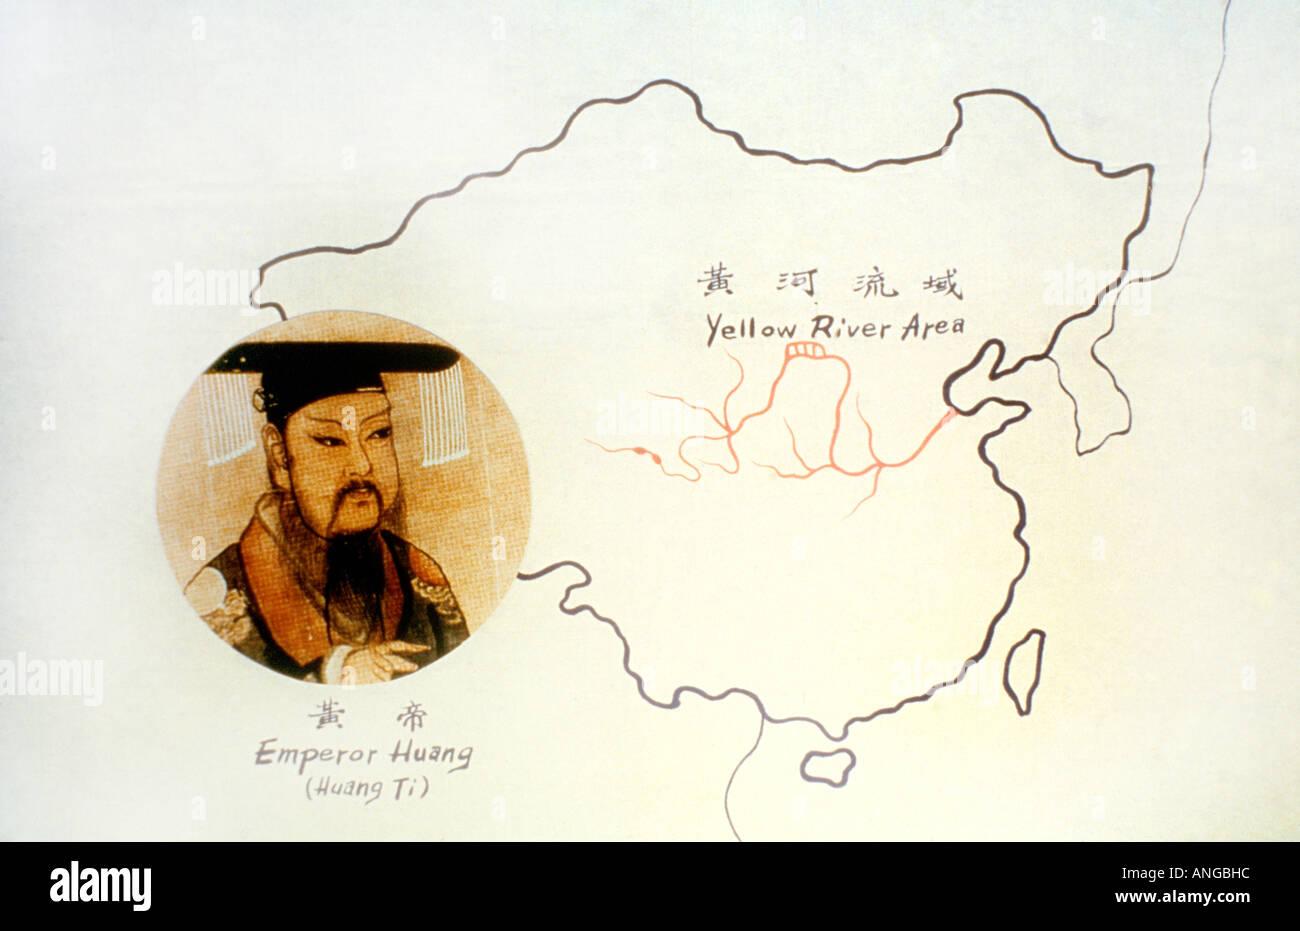 Taiwan Emperor Huang And Yellow River ( Yuang Ti ) Stock Photo